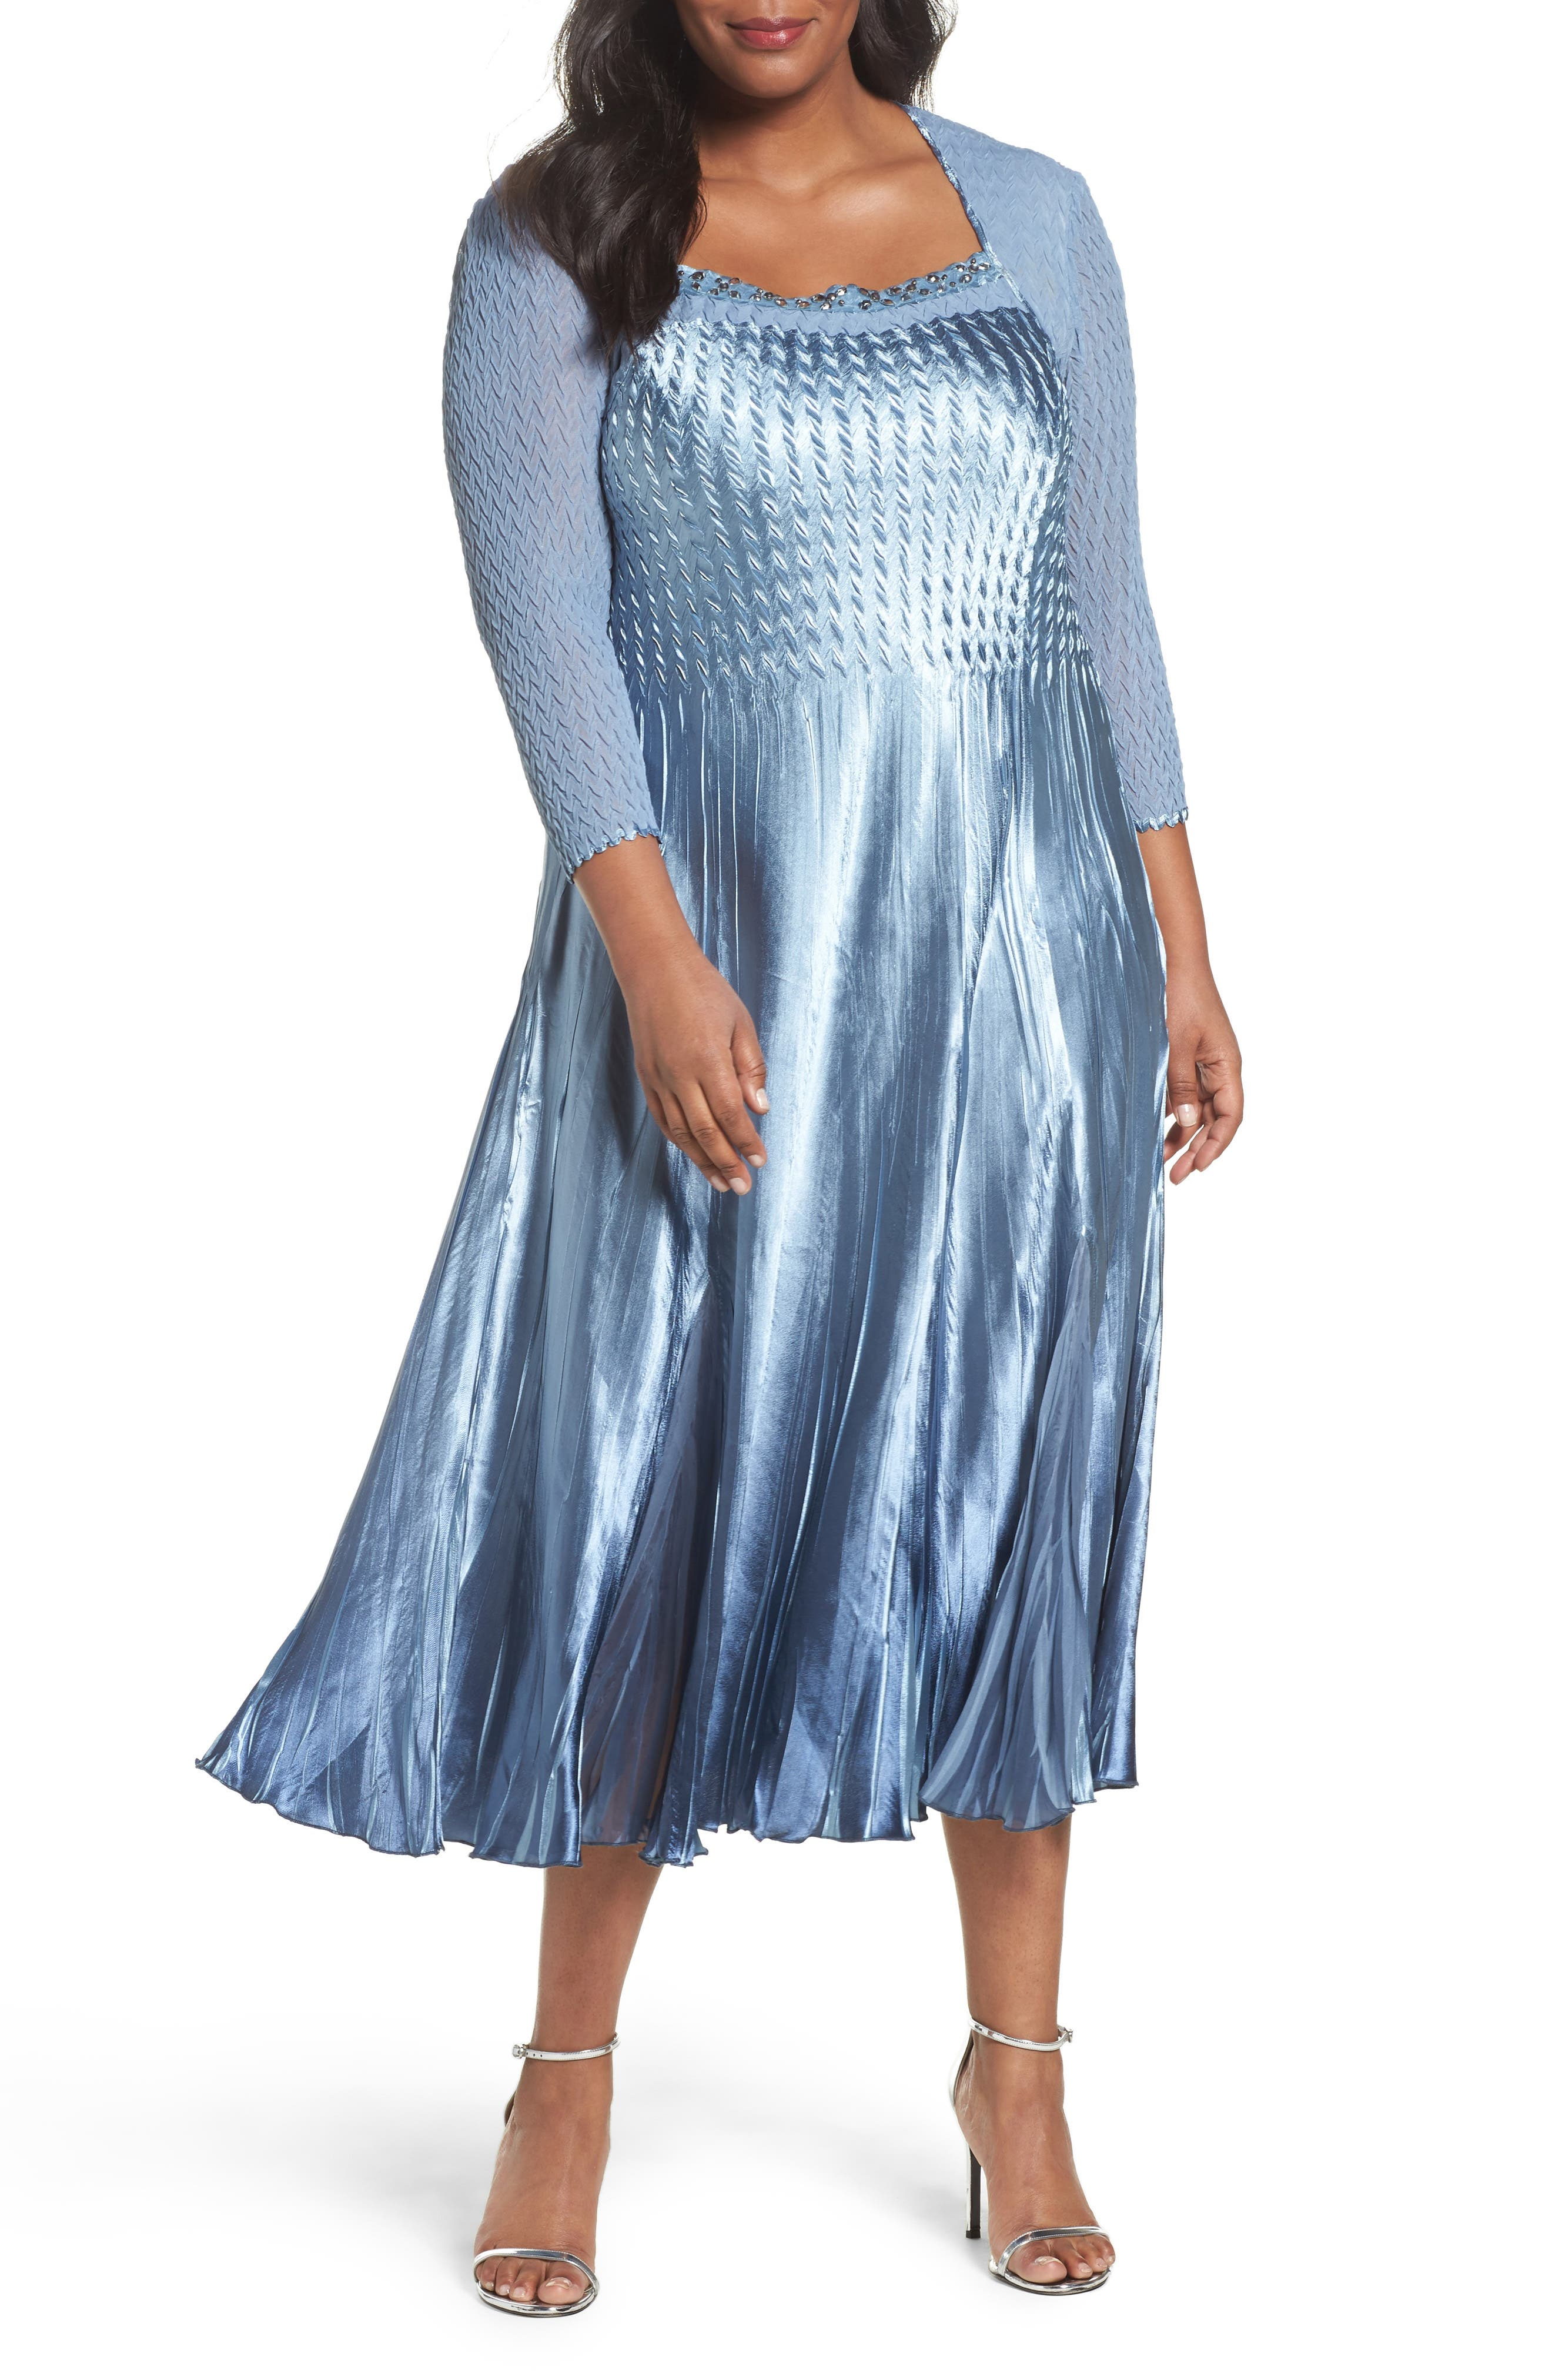 Komarov Embellished Mixed Media A-Line Dress (Plus Size)